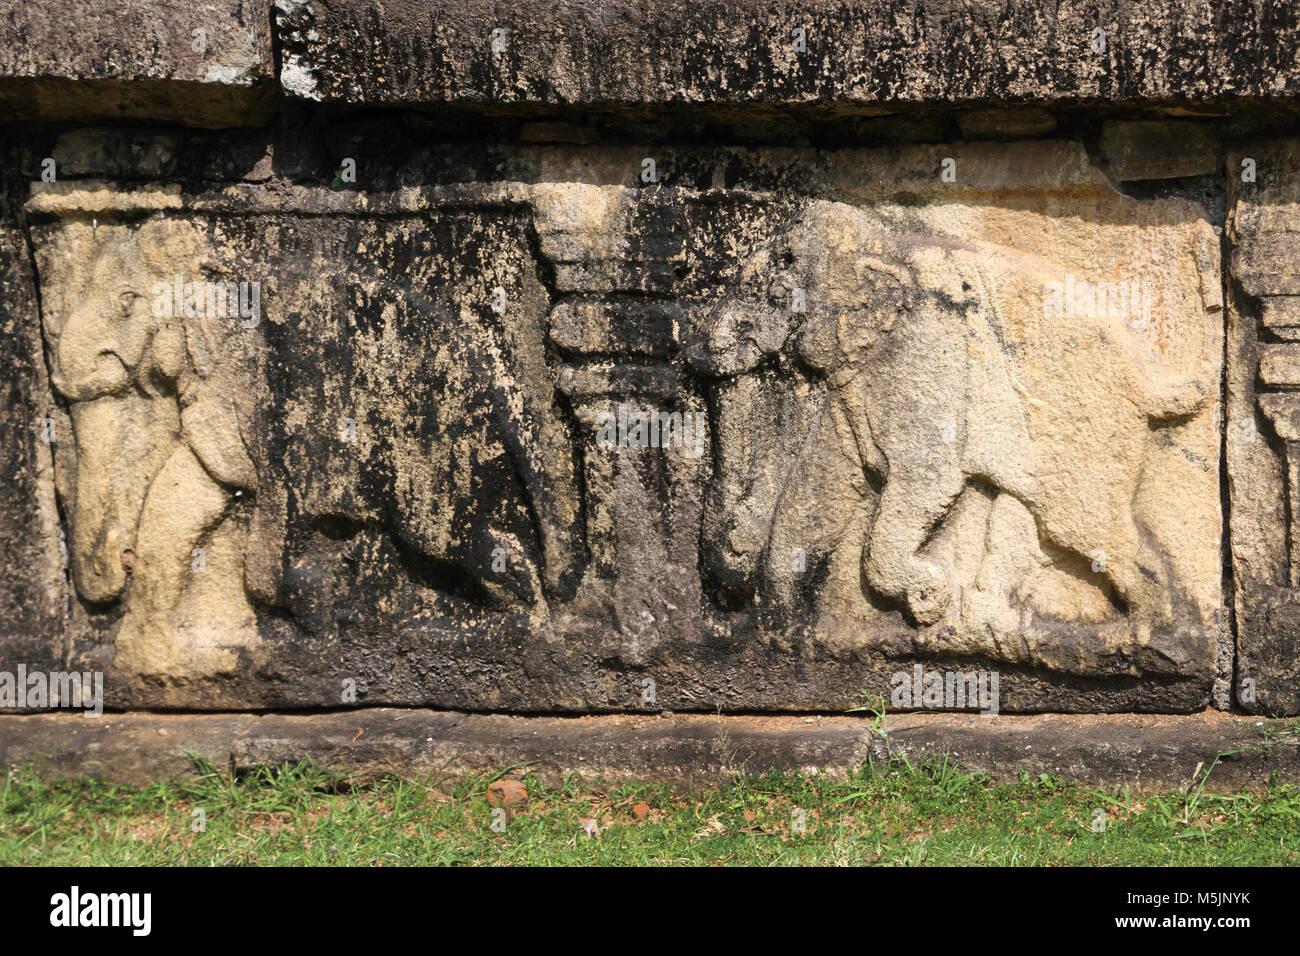 Polonnaruwa North Central Province Sri Lanka King's Council Chamber - Stock Image